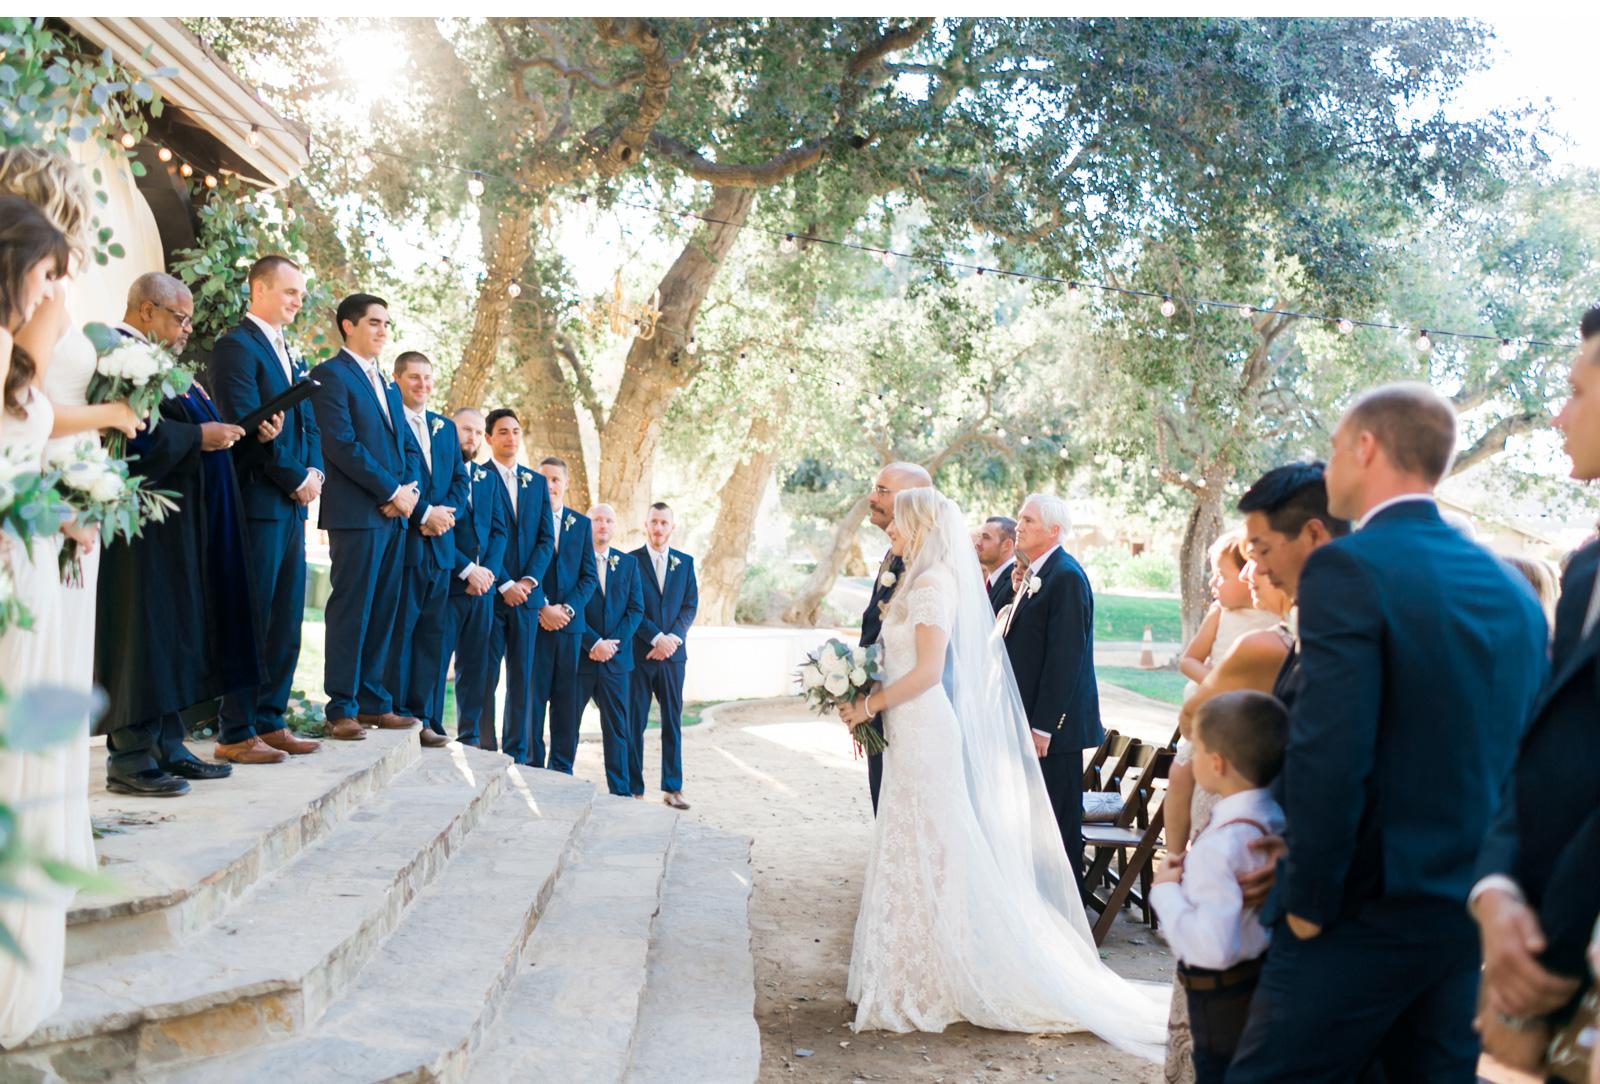 San-Luis-Obispo-Wedding-Photographer-Style-Me-Pretty-Natalie-Schutt-Photography_12.jpg